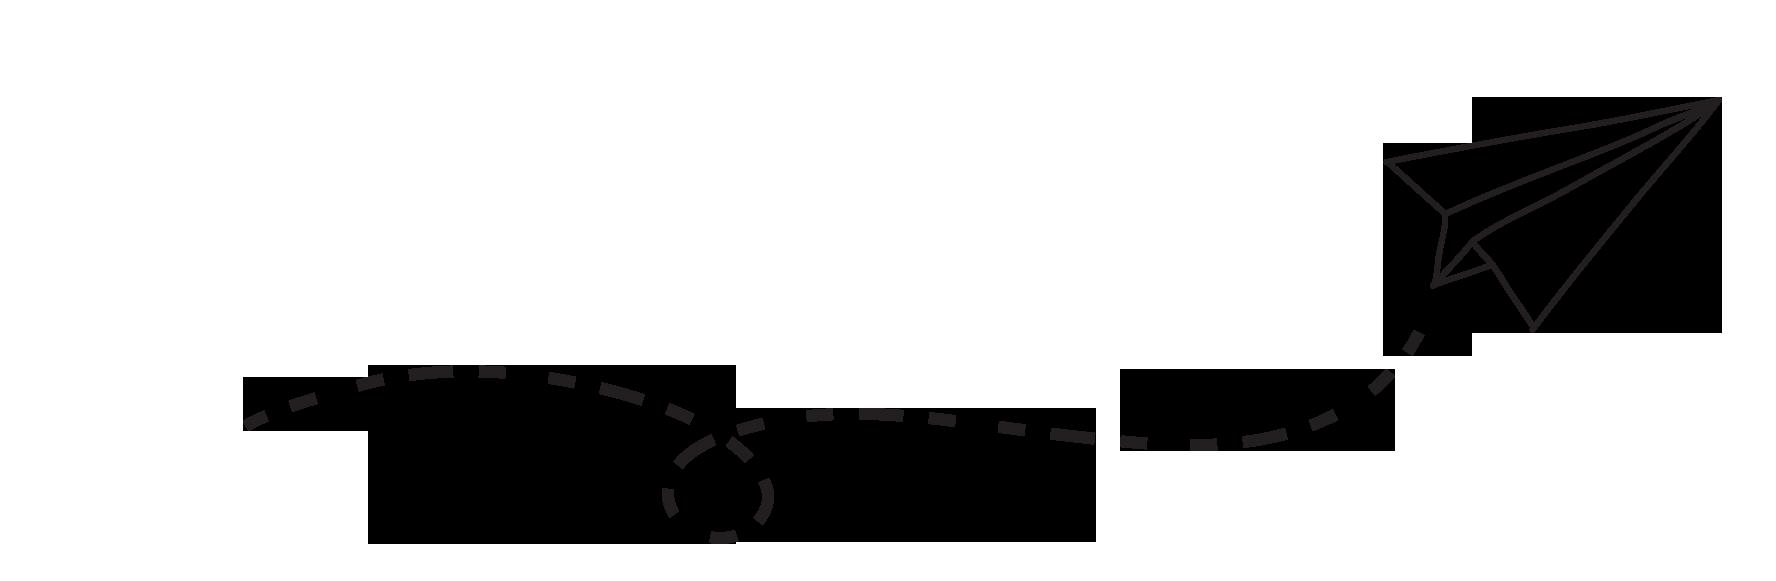 White planplane png image. Clipart paper line paper